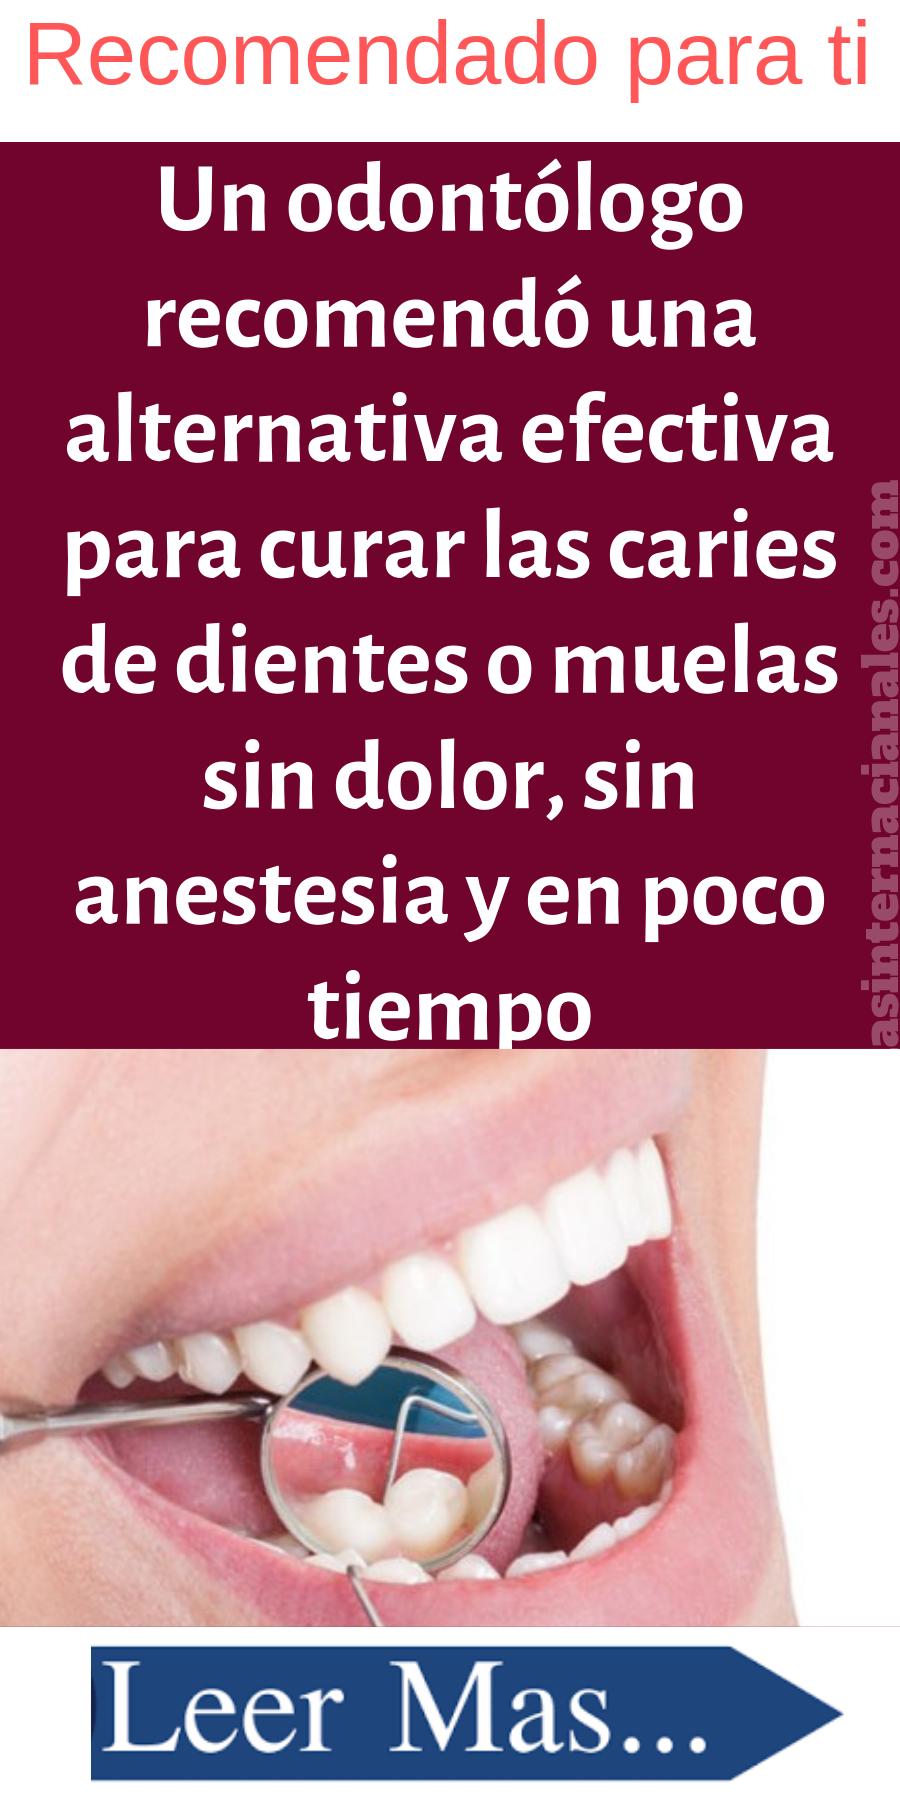 Anestesia casera para dientes